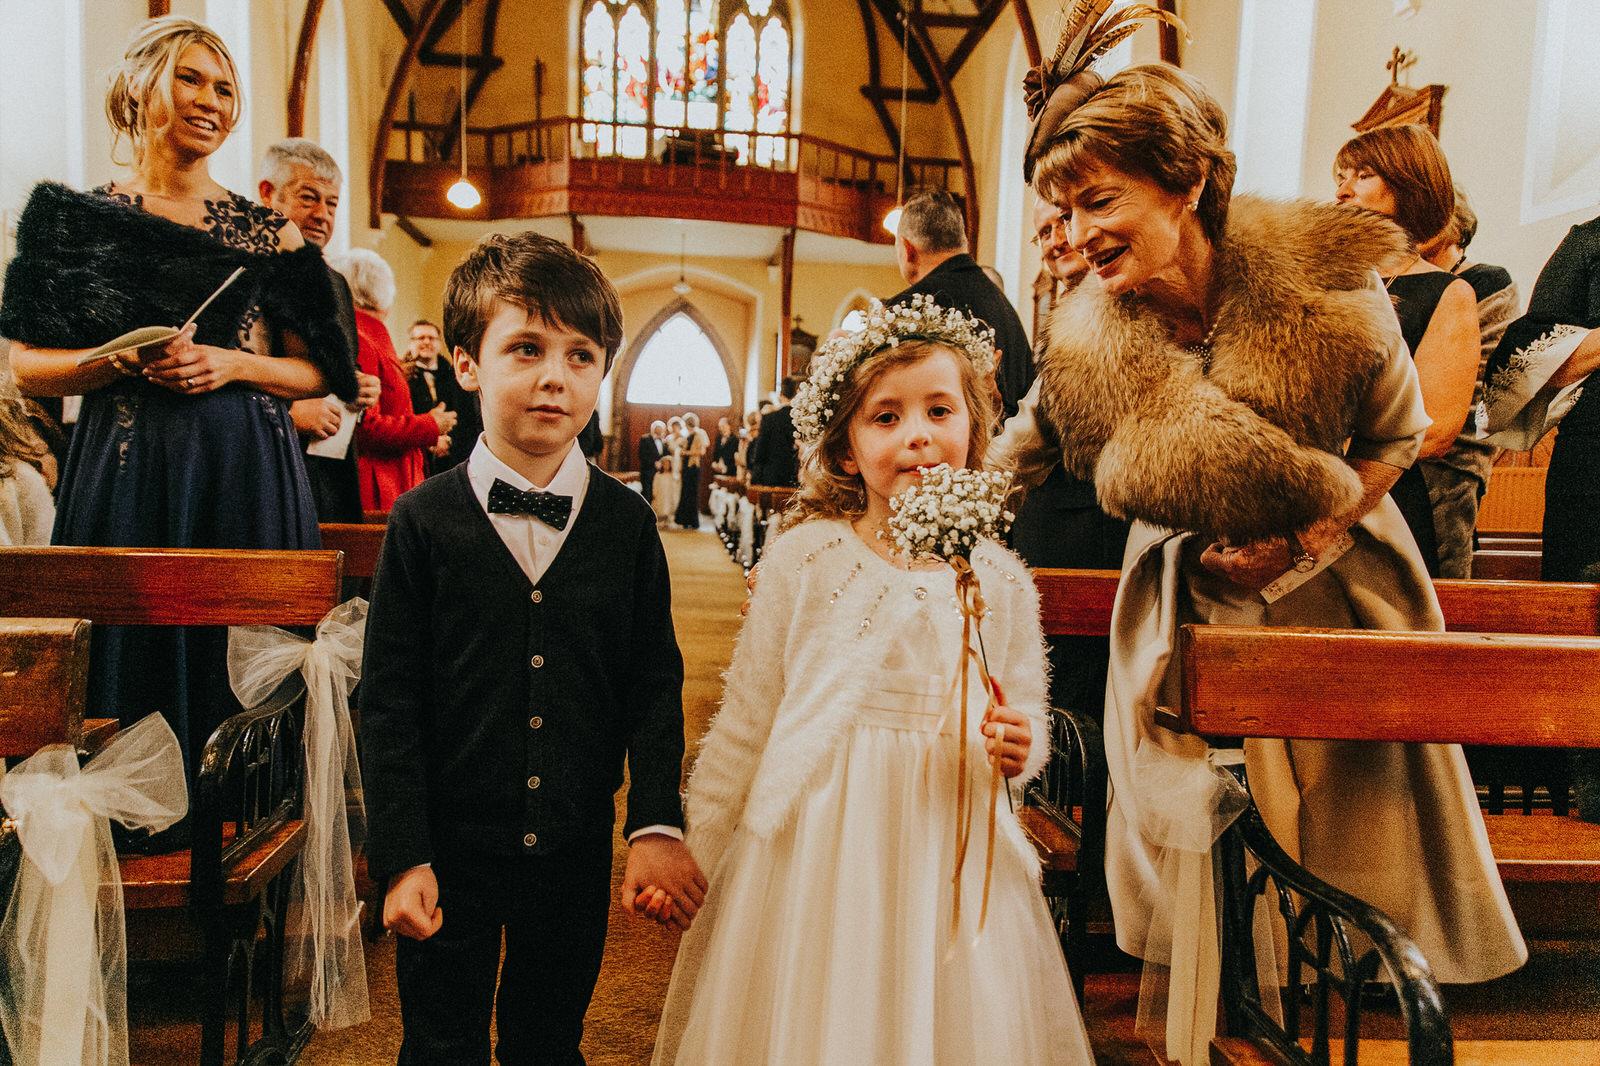 Dunbrody_House_Wedding_photographer_069.jpg